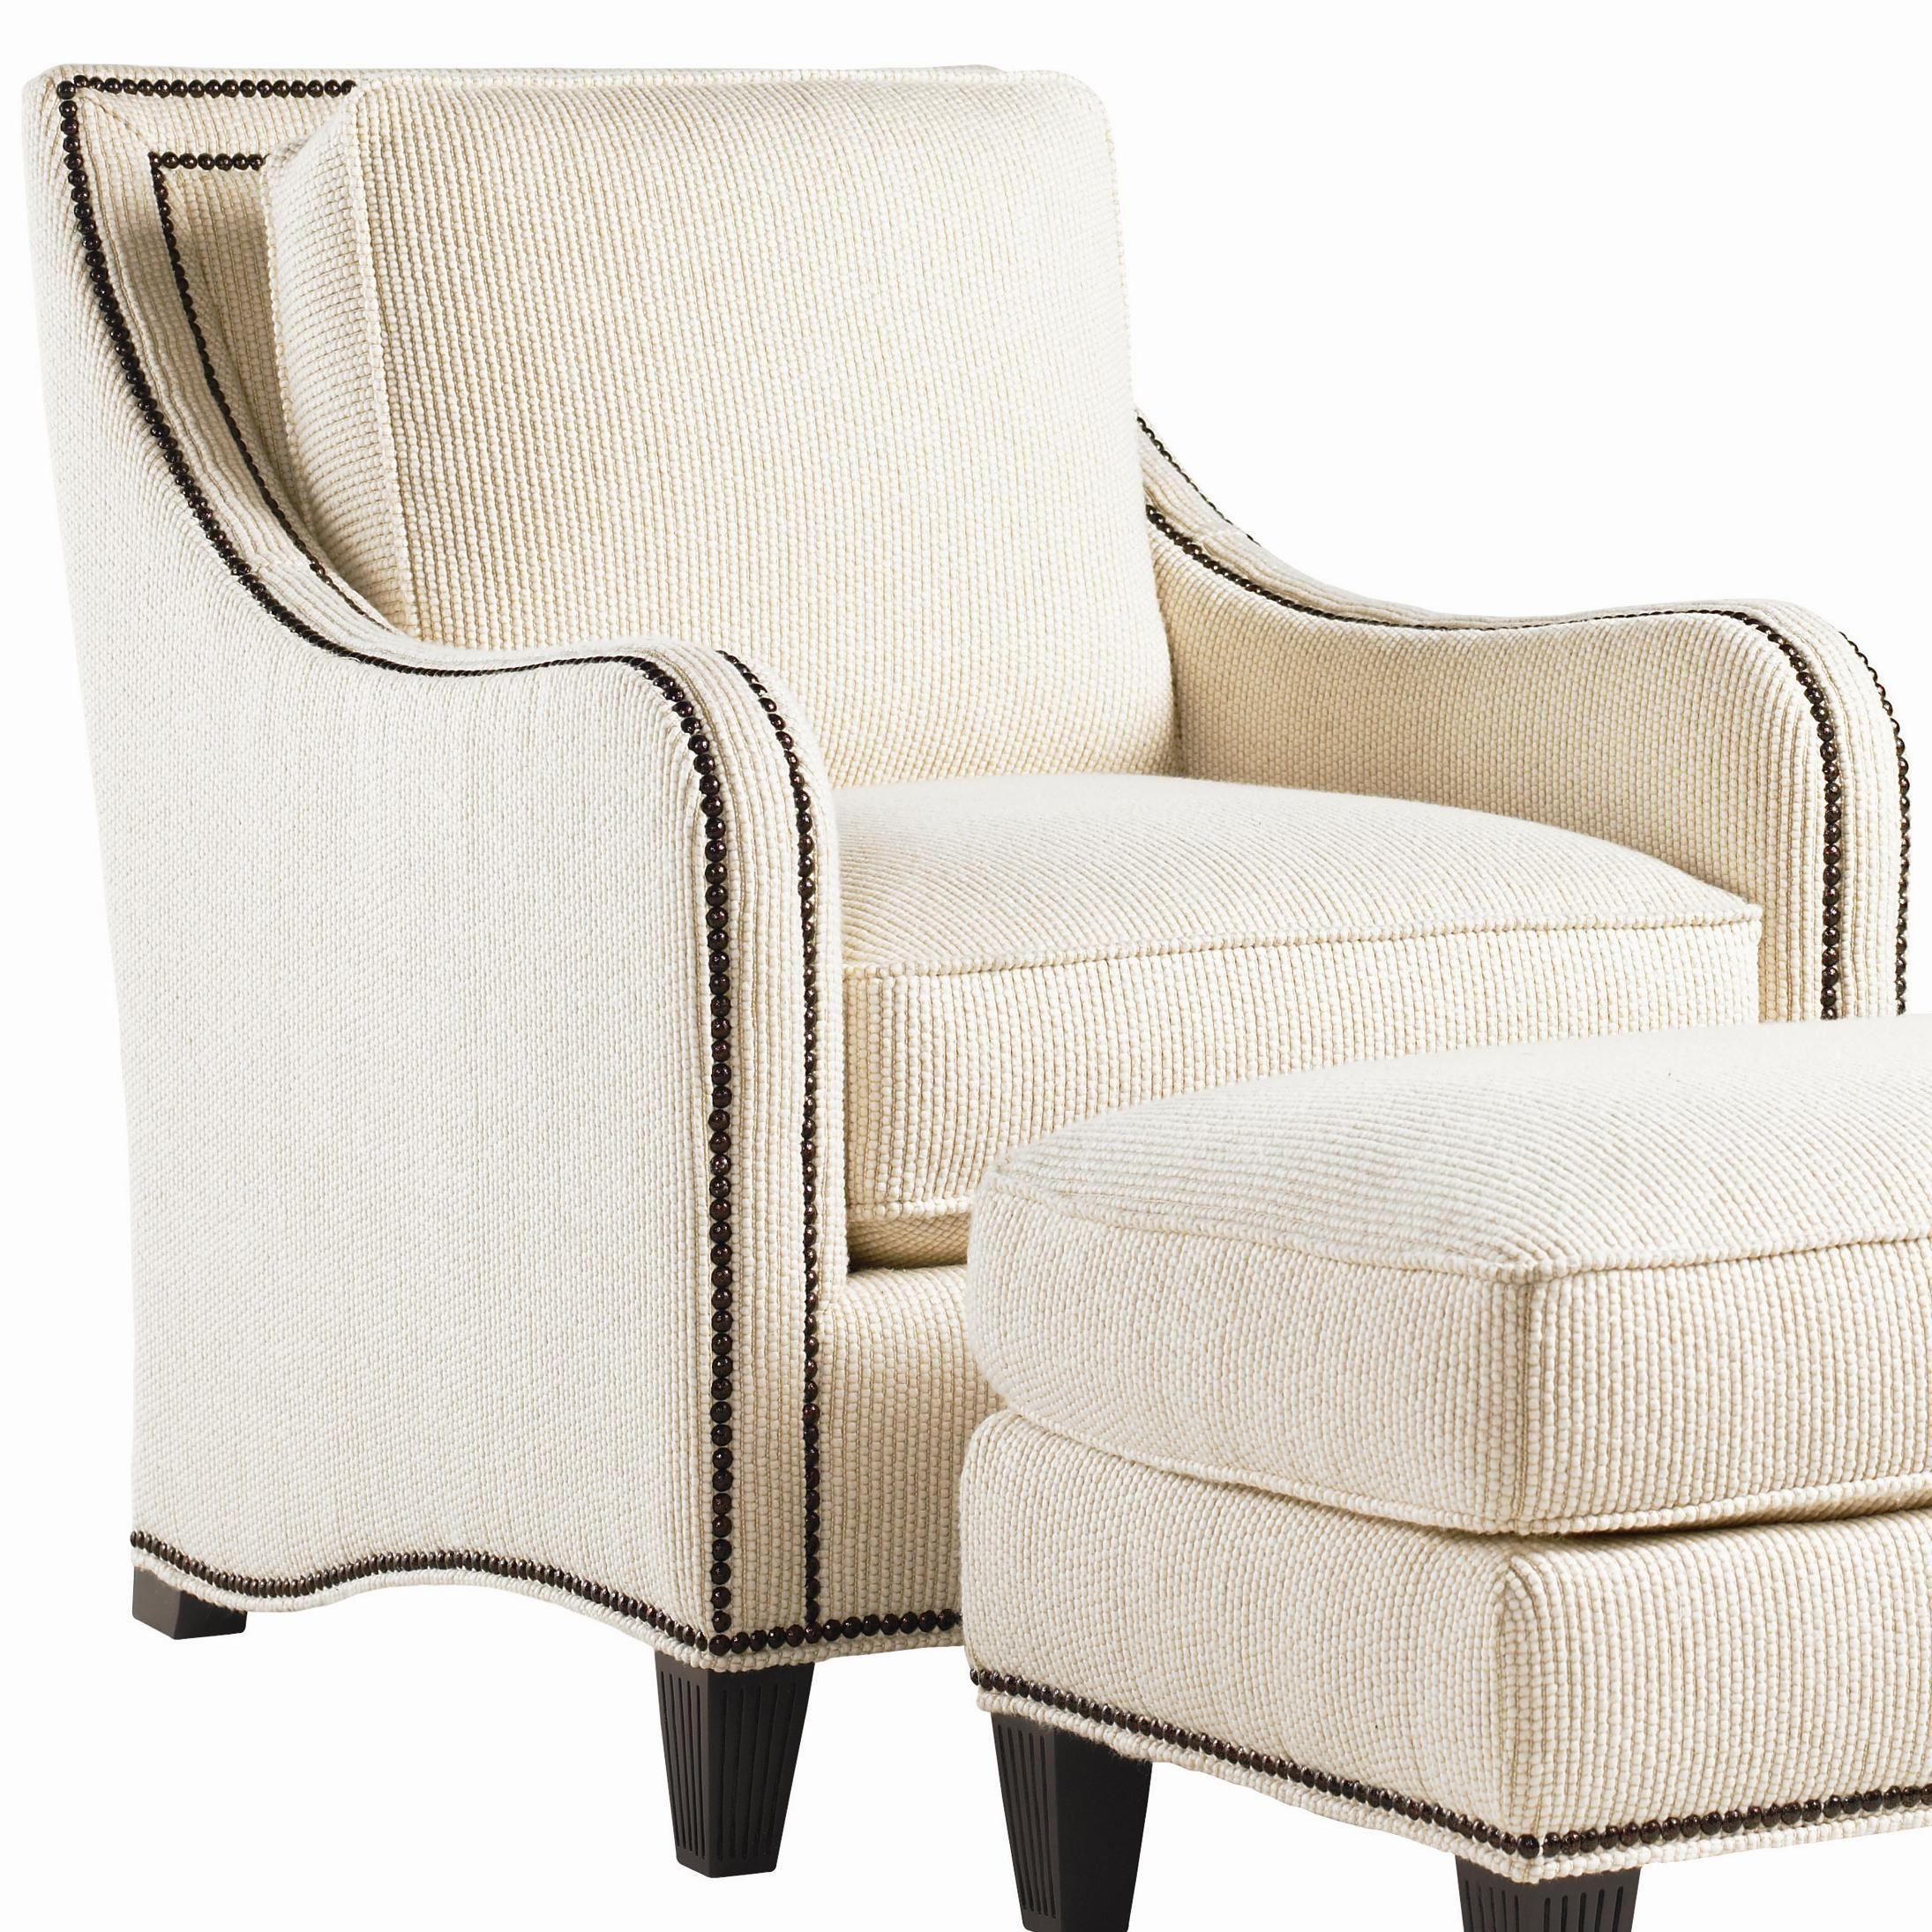 Royal Kahala Koko Raffia Chair With Contrasting Cushions By Tommy Bahama  Home   Baeru0027s Furniture